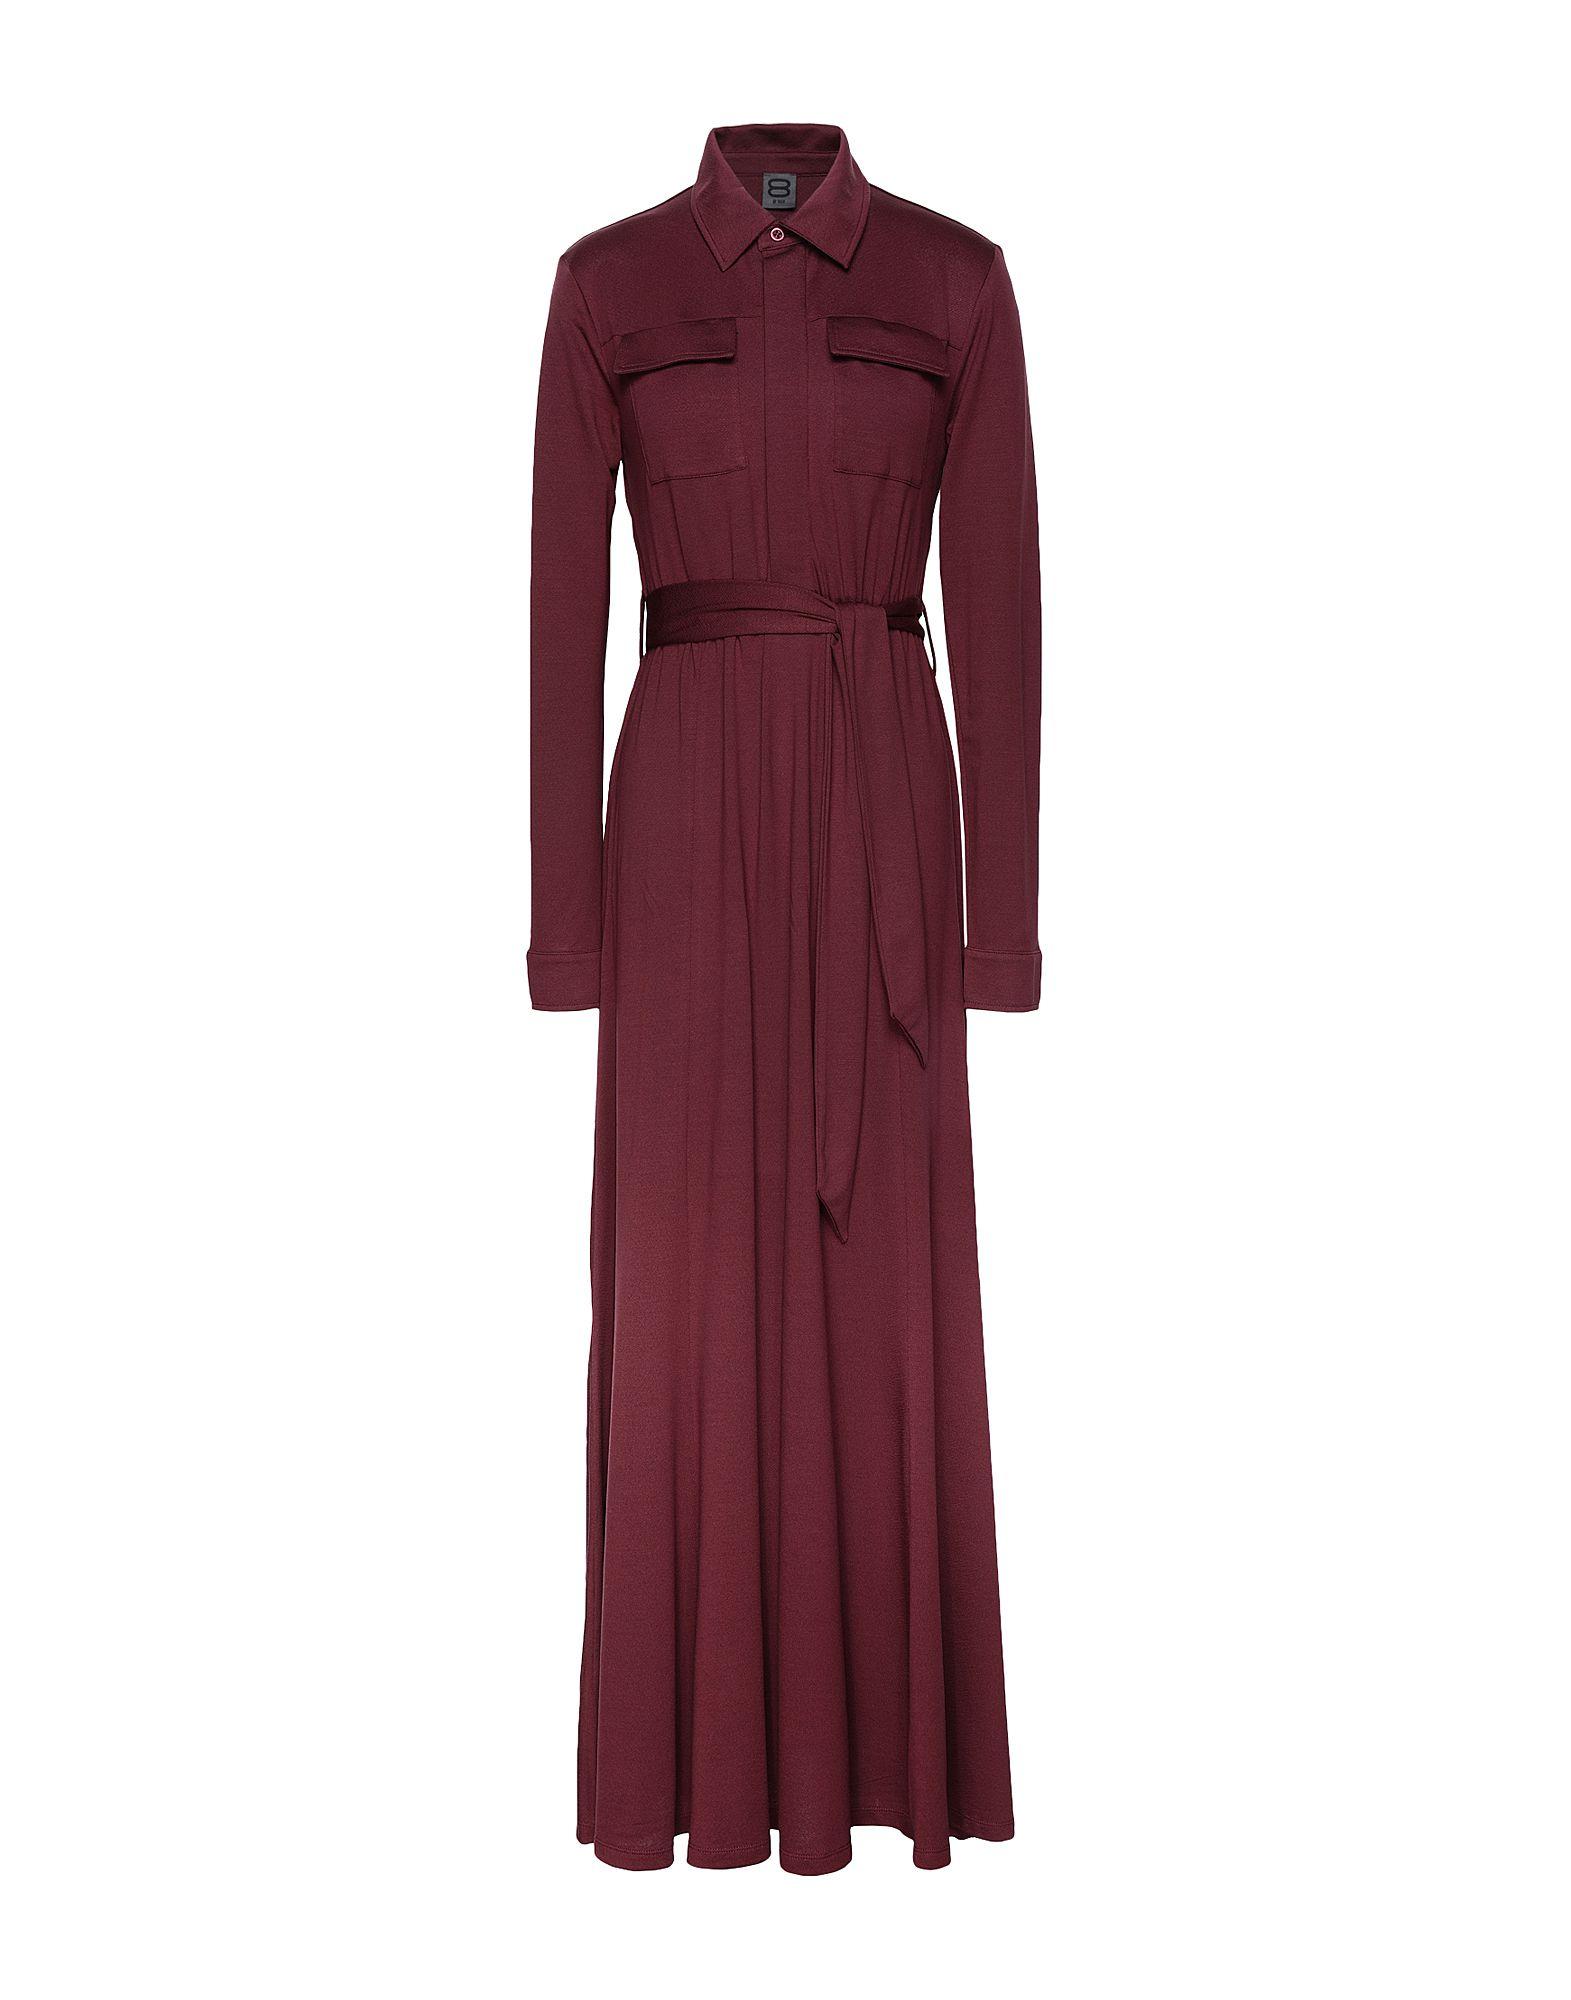 цена на 8 by YOOX Длинное платье